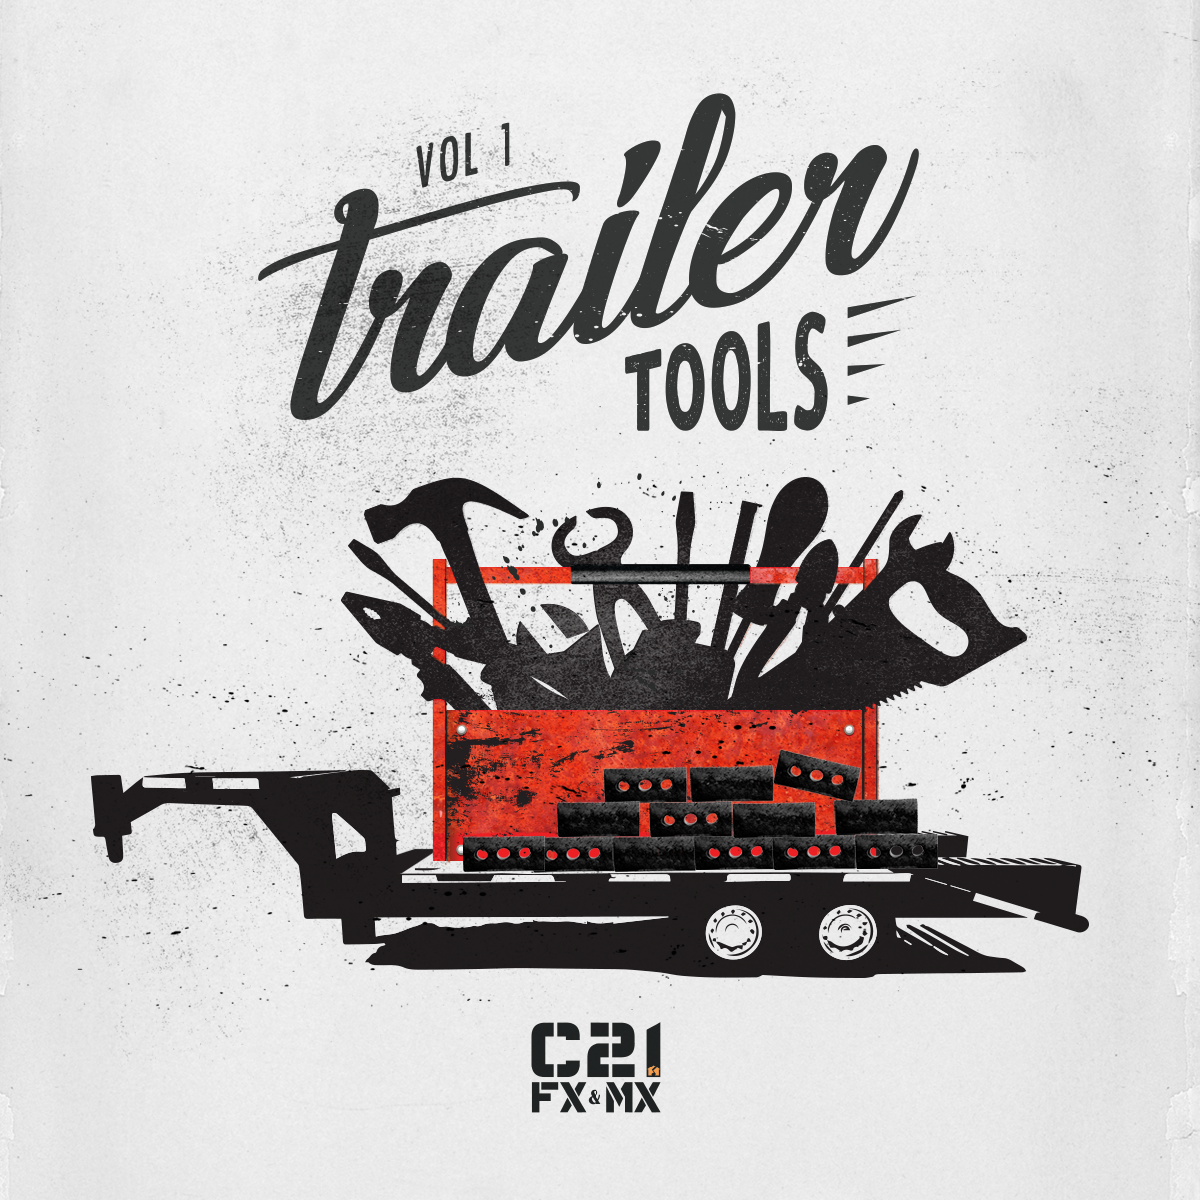 Cabin21_1200x1200_TrailerTools.logo.png